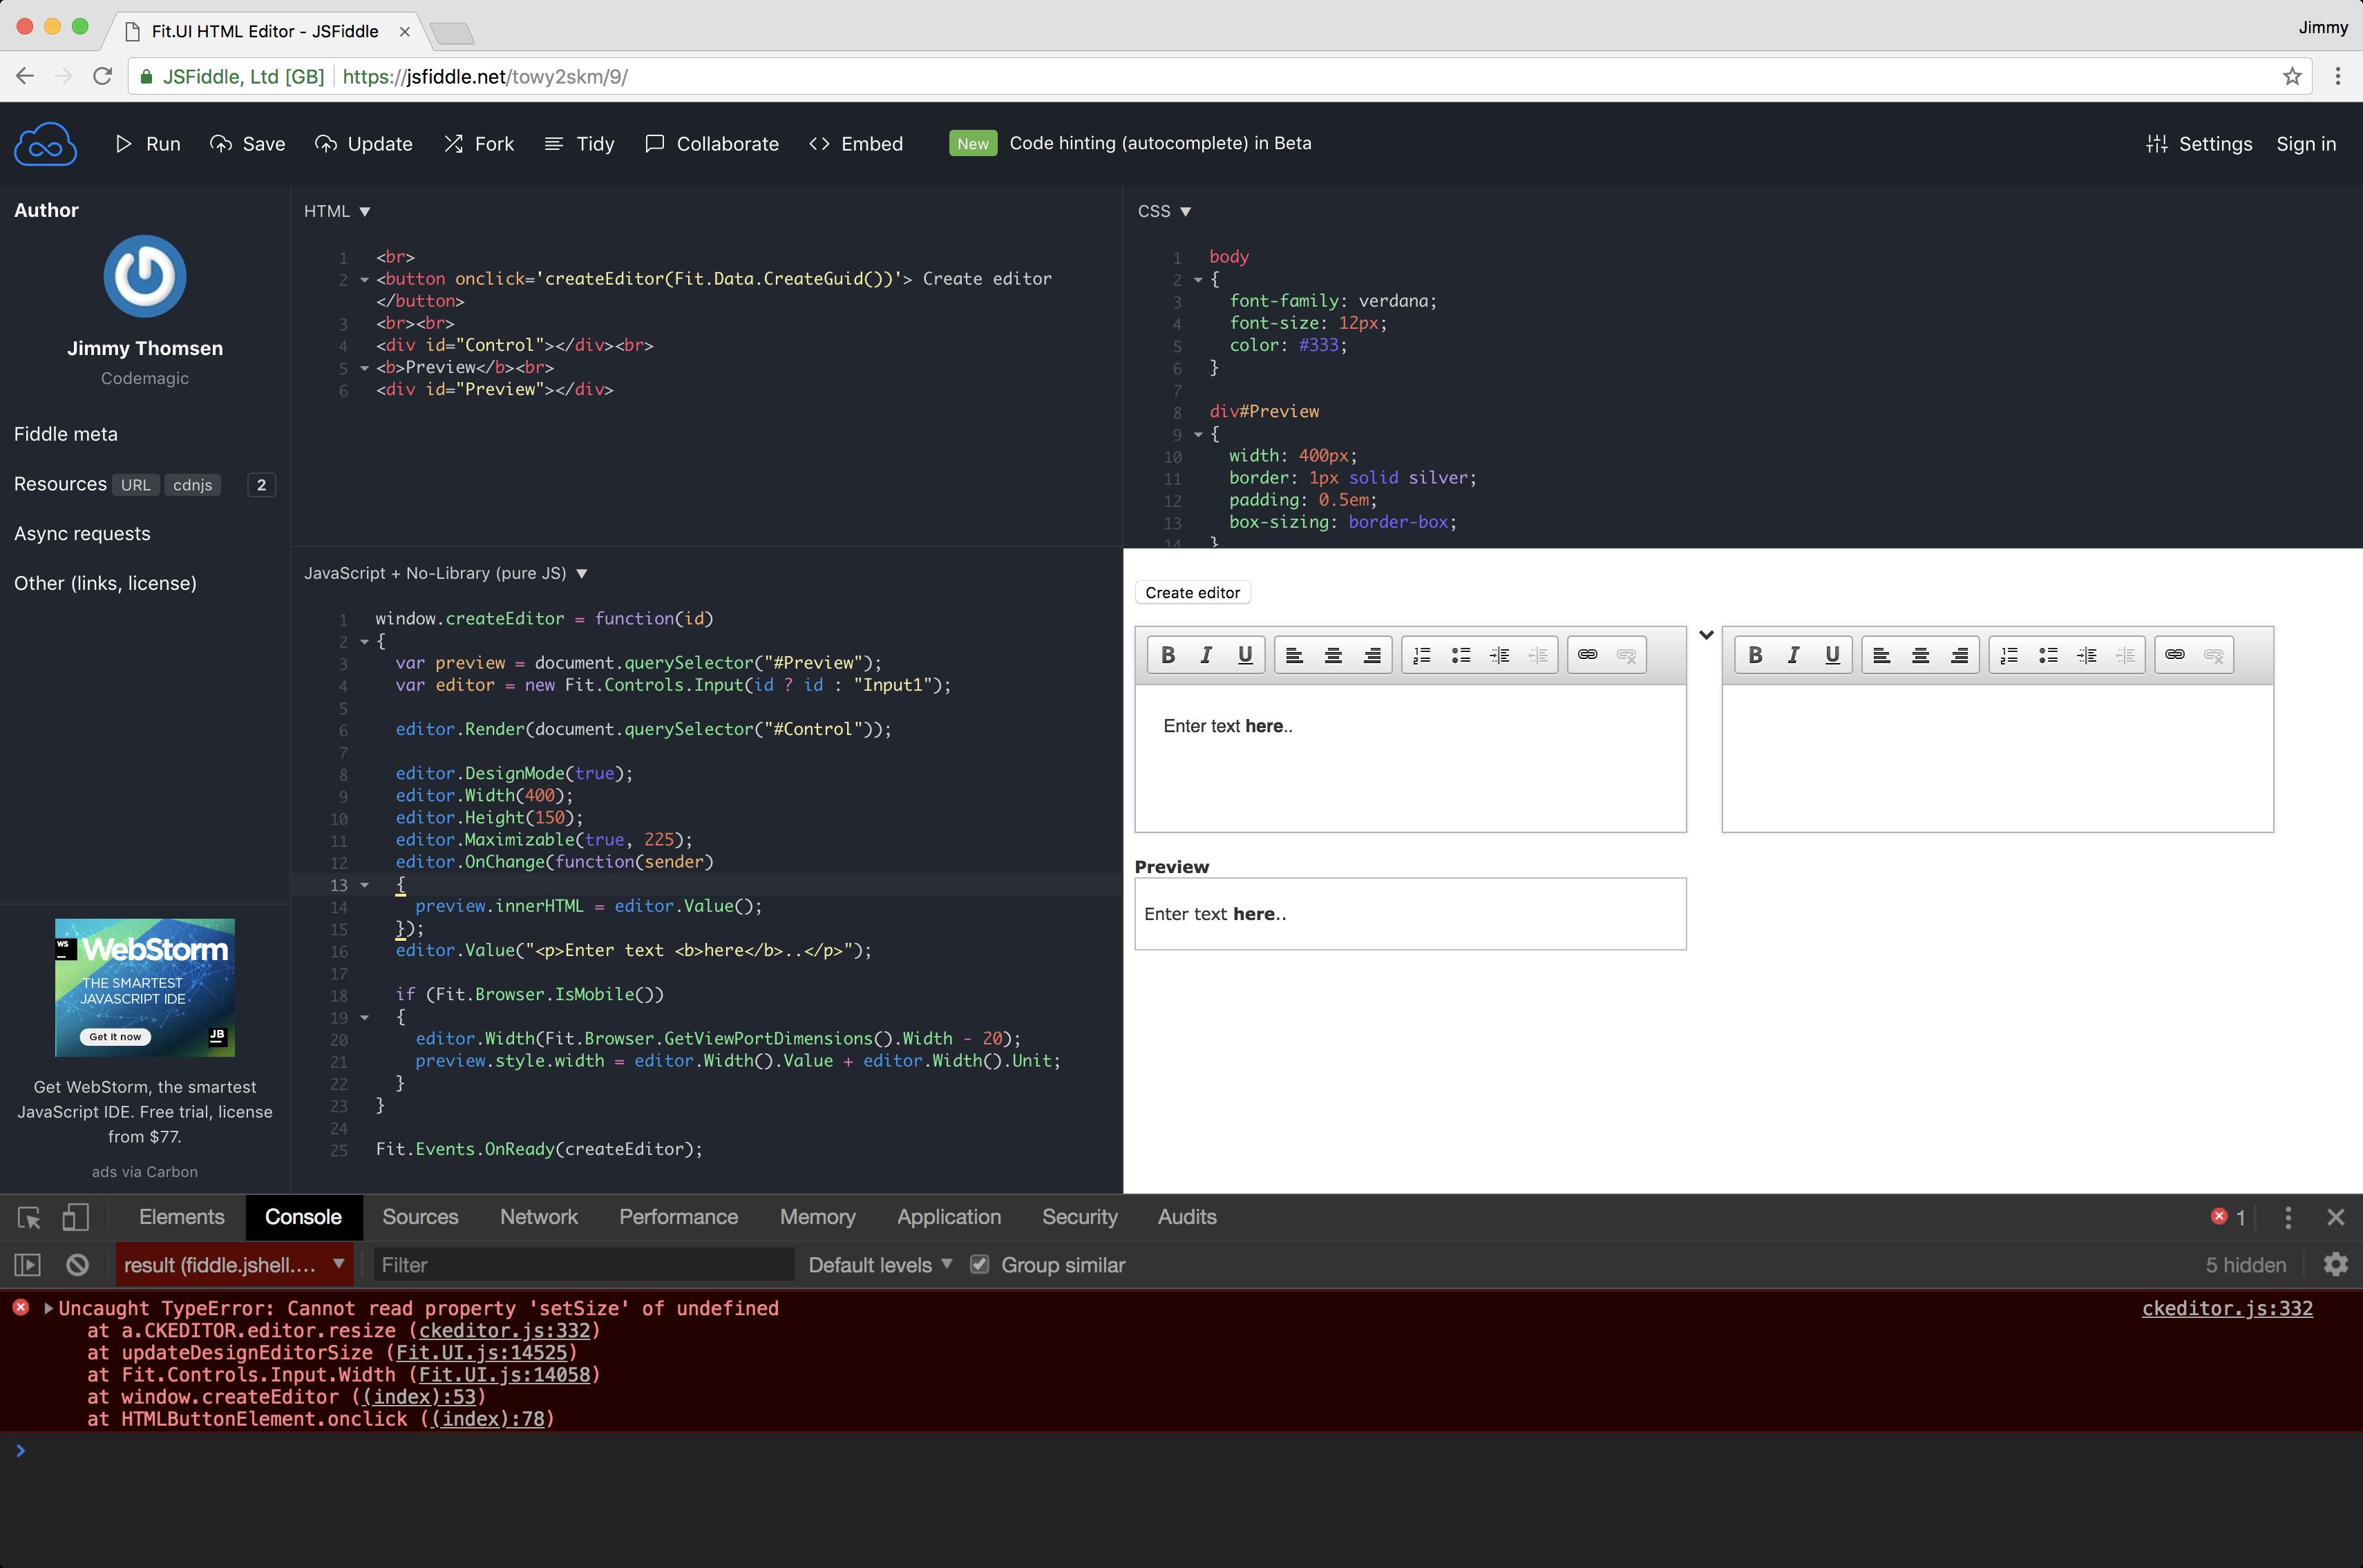 Input in DesignMode (CKEditor): Uncaught TypeError: Cannot read